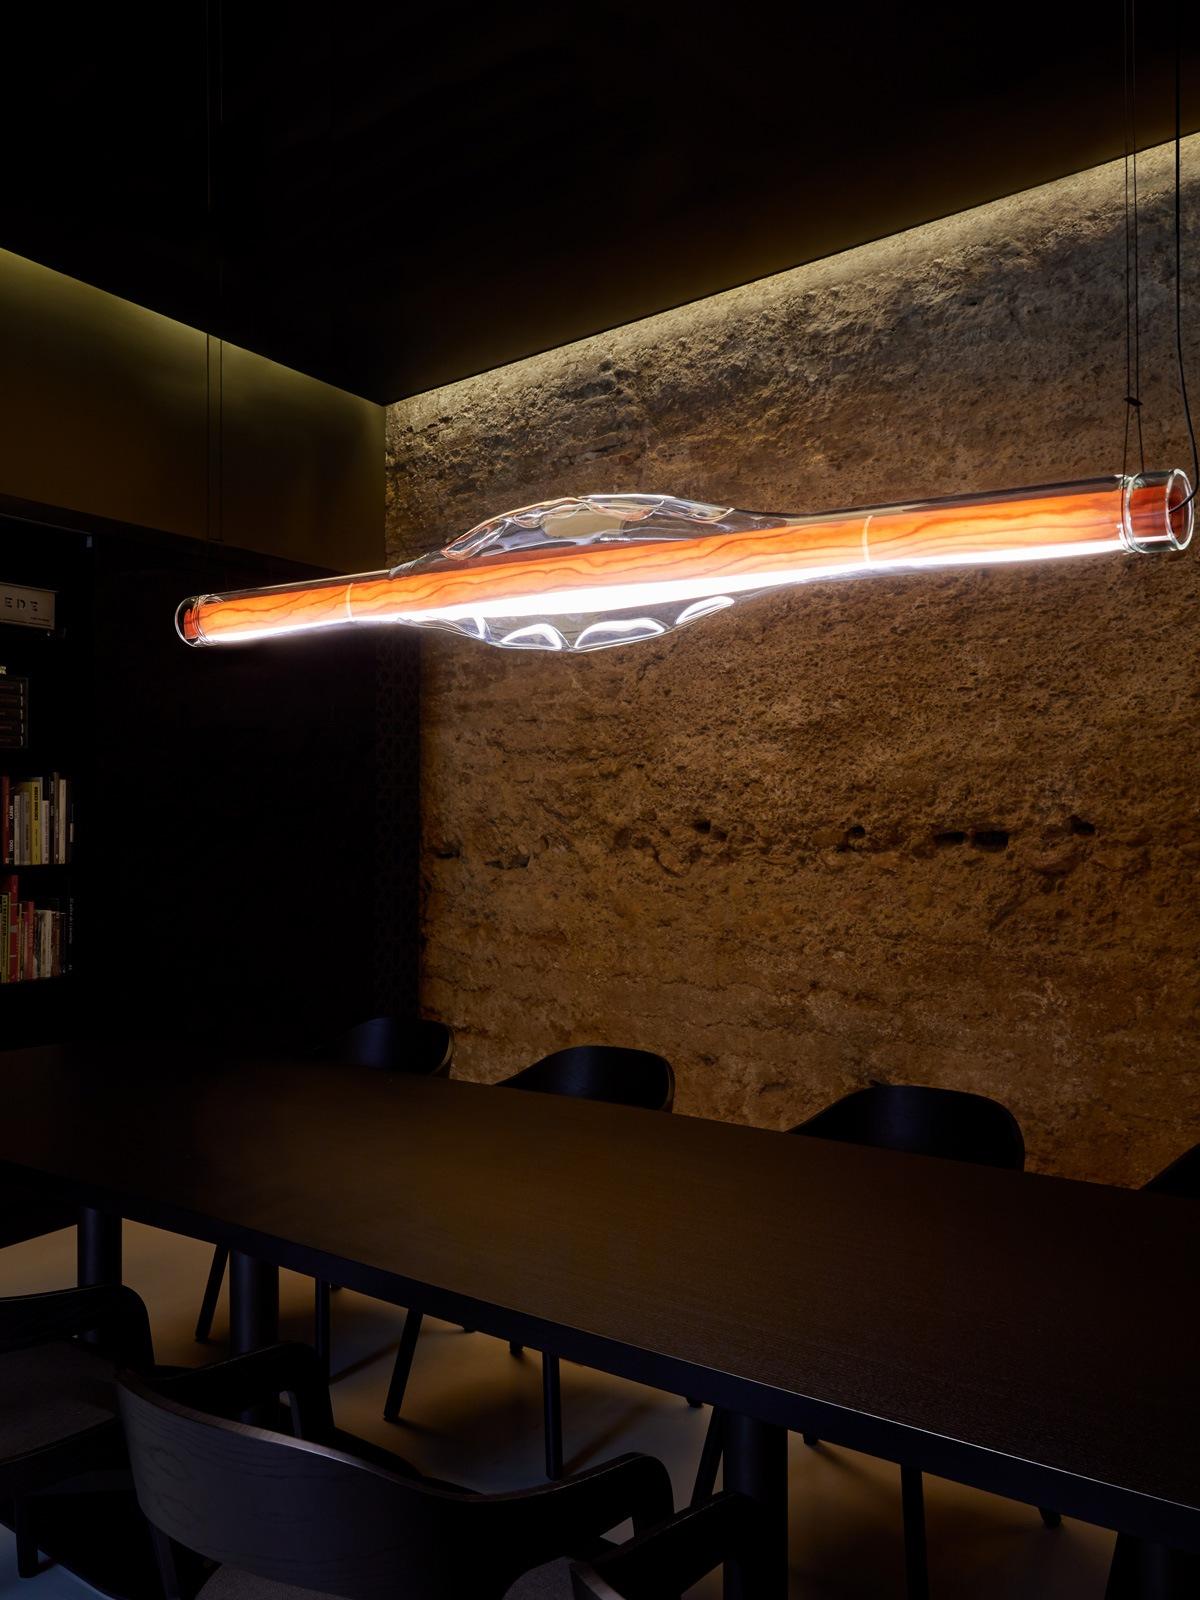 Dune Pendelleuchte LZF Lamps DesignOrt Lampen Berlin